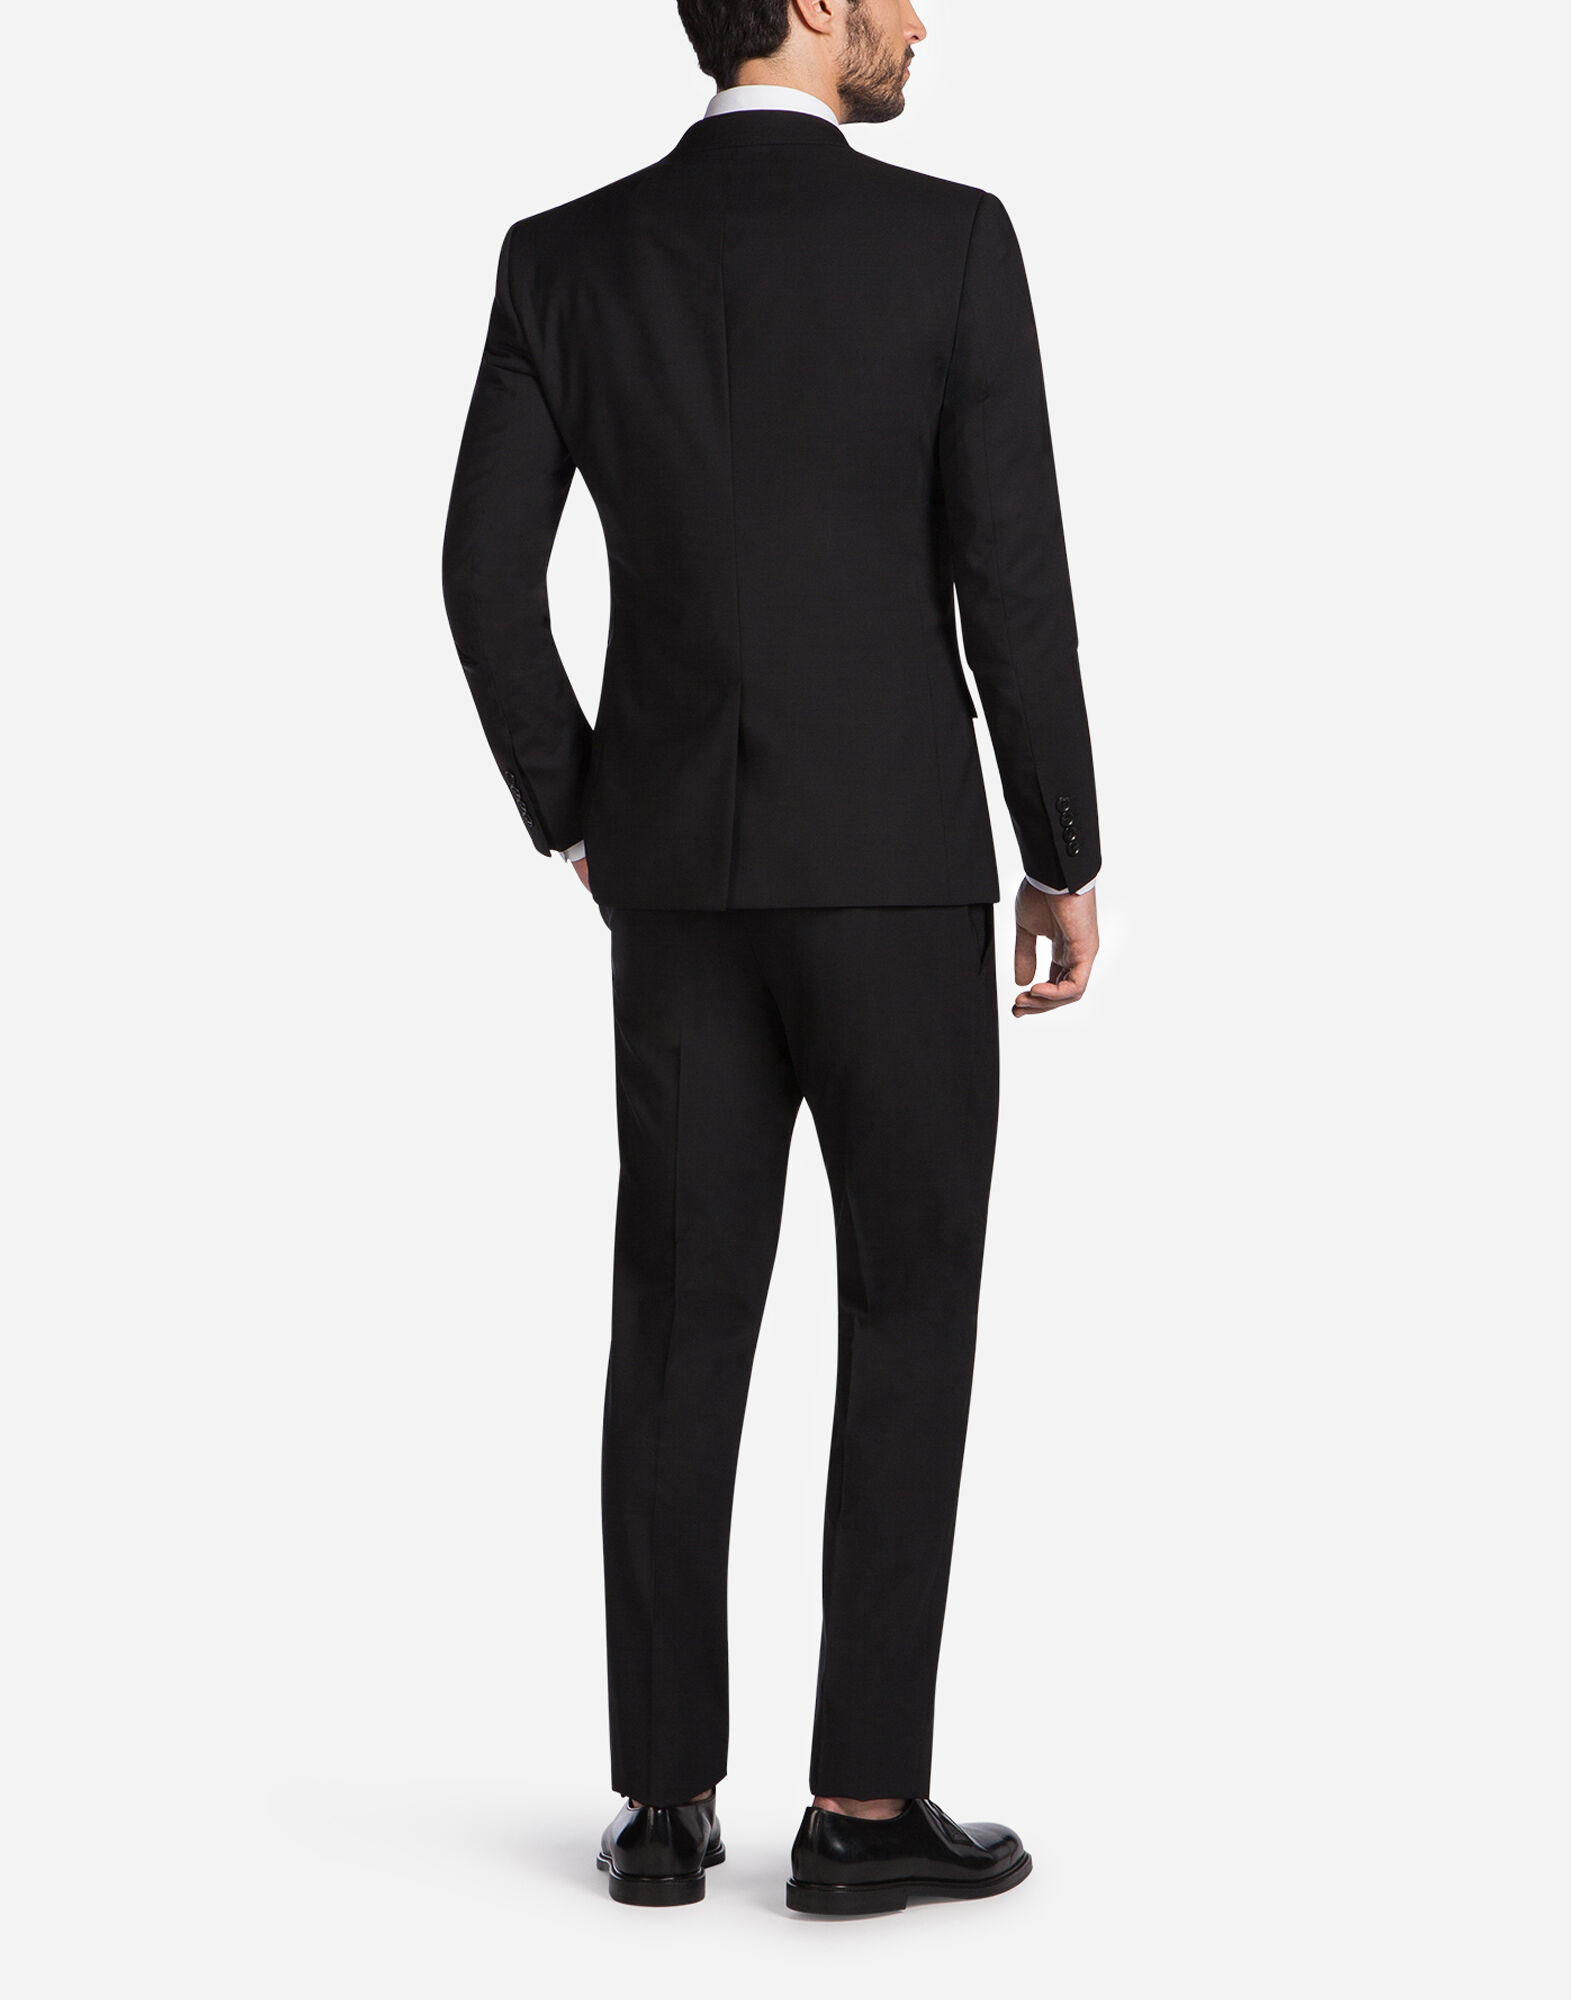 Dolce&Gabbana STRETCH WOOL DRESS